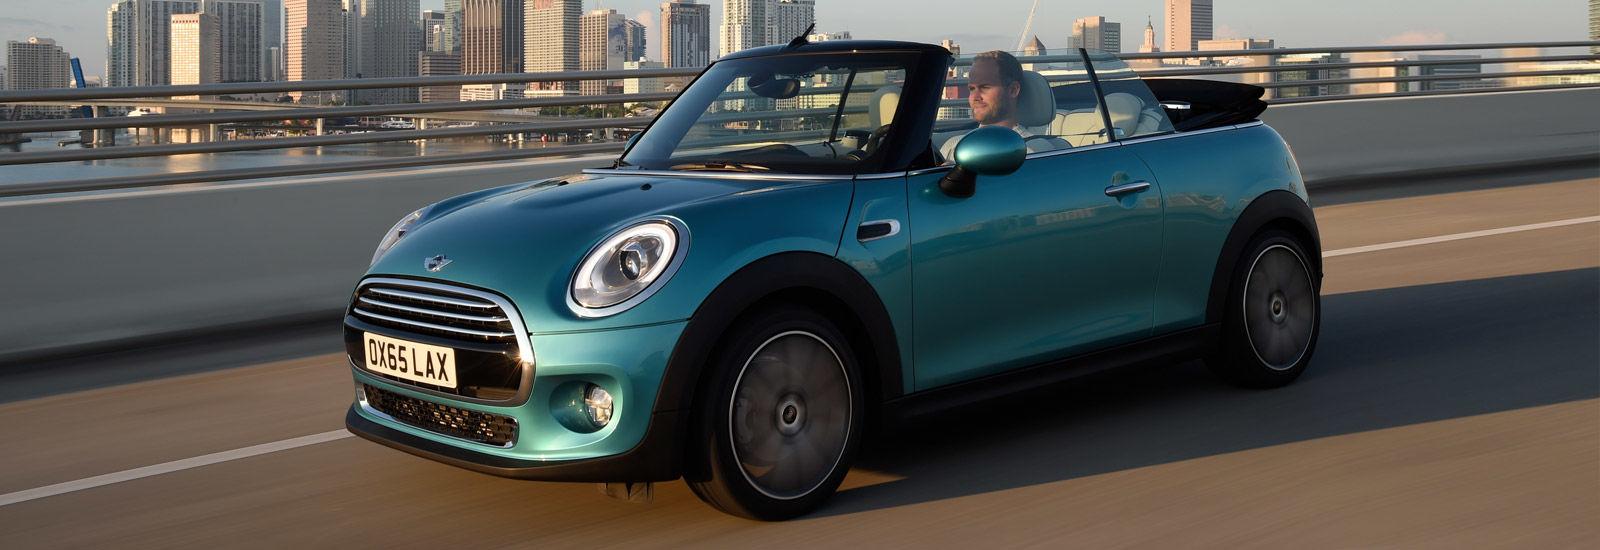 new mini car releaseNew Mini Convertible price specs  release date  carwow